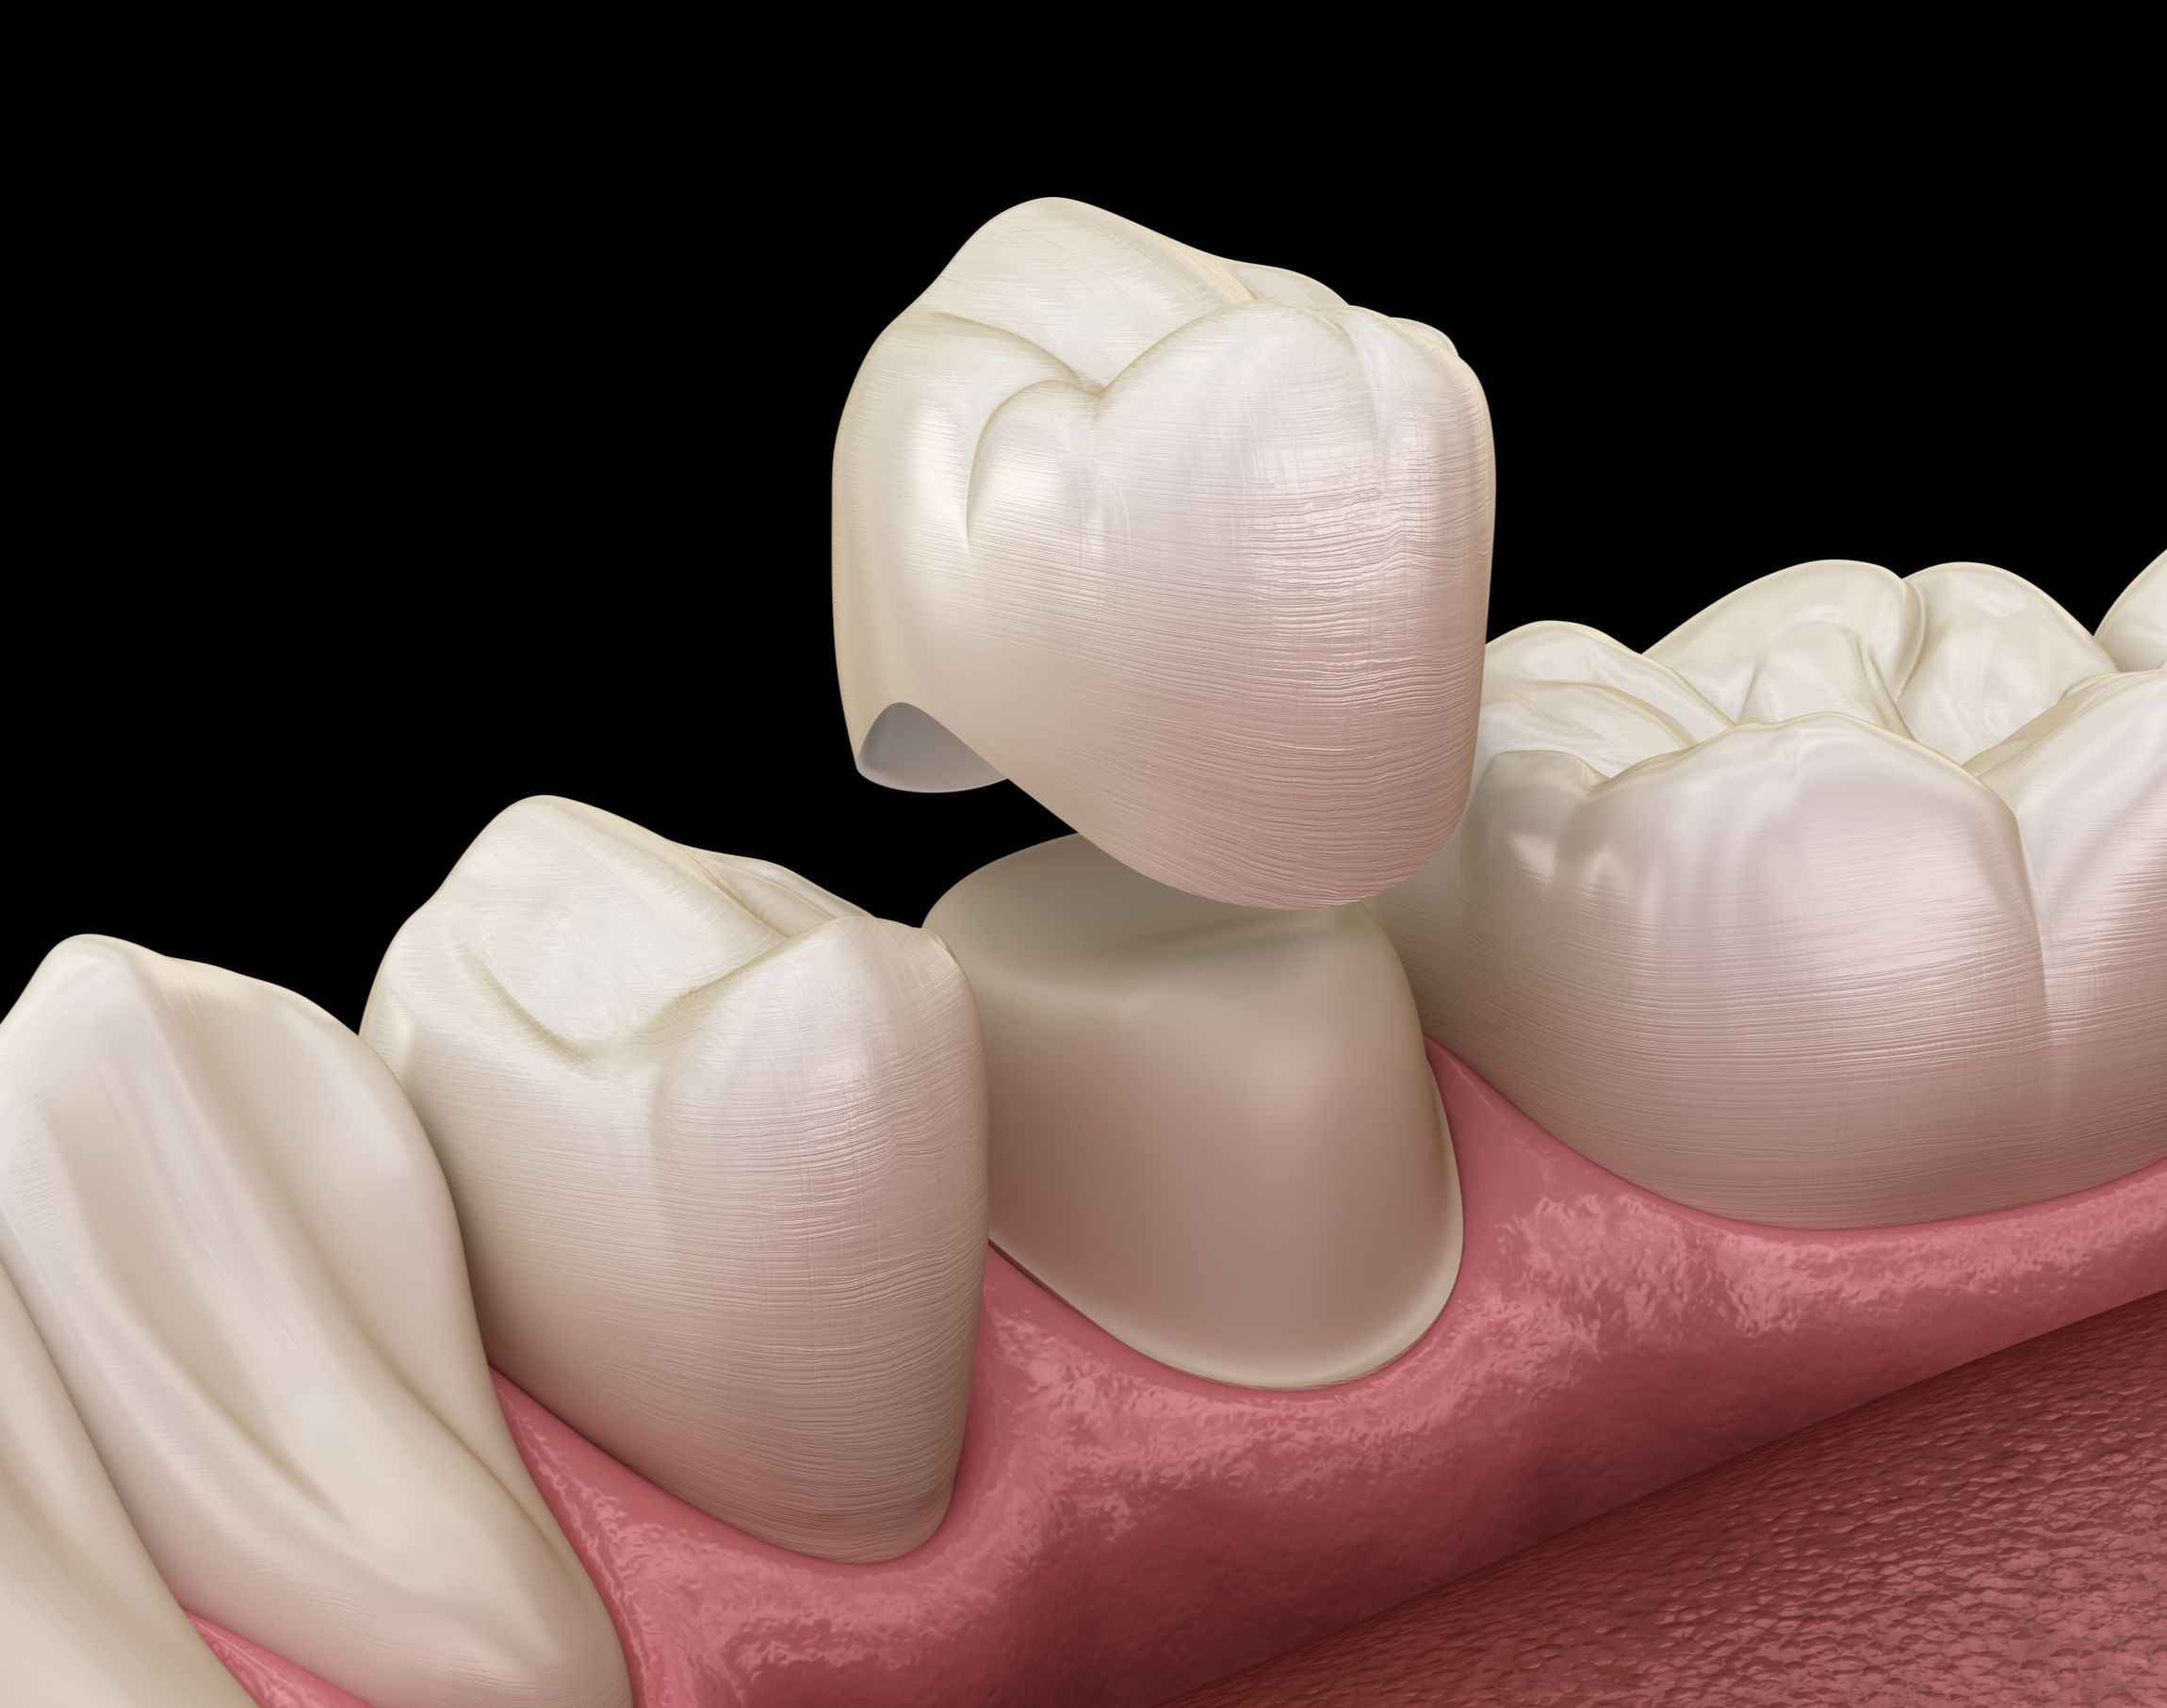 A porcelain dental crown